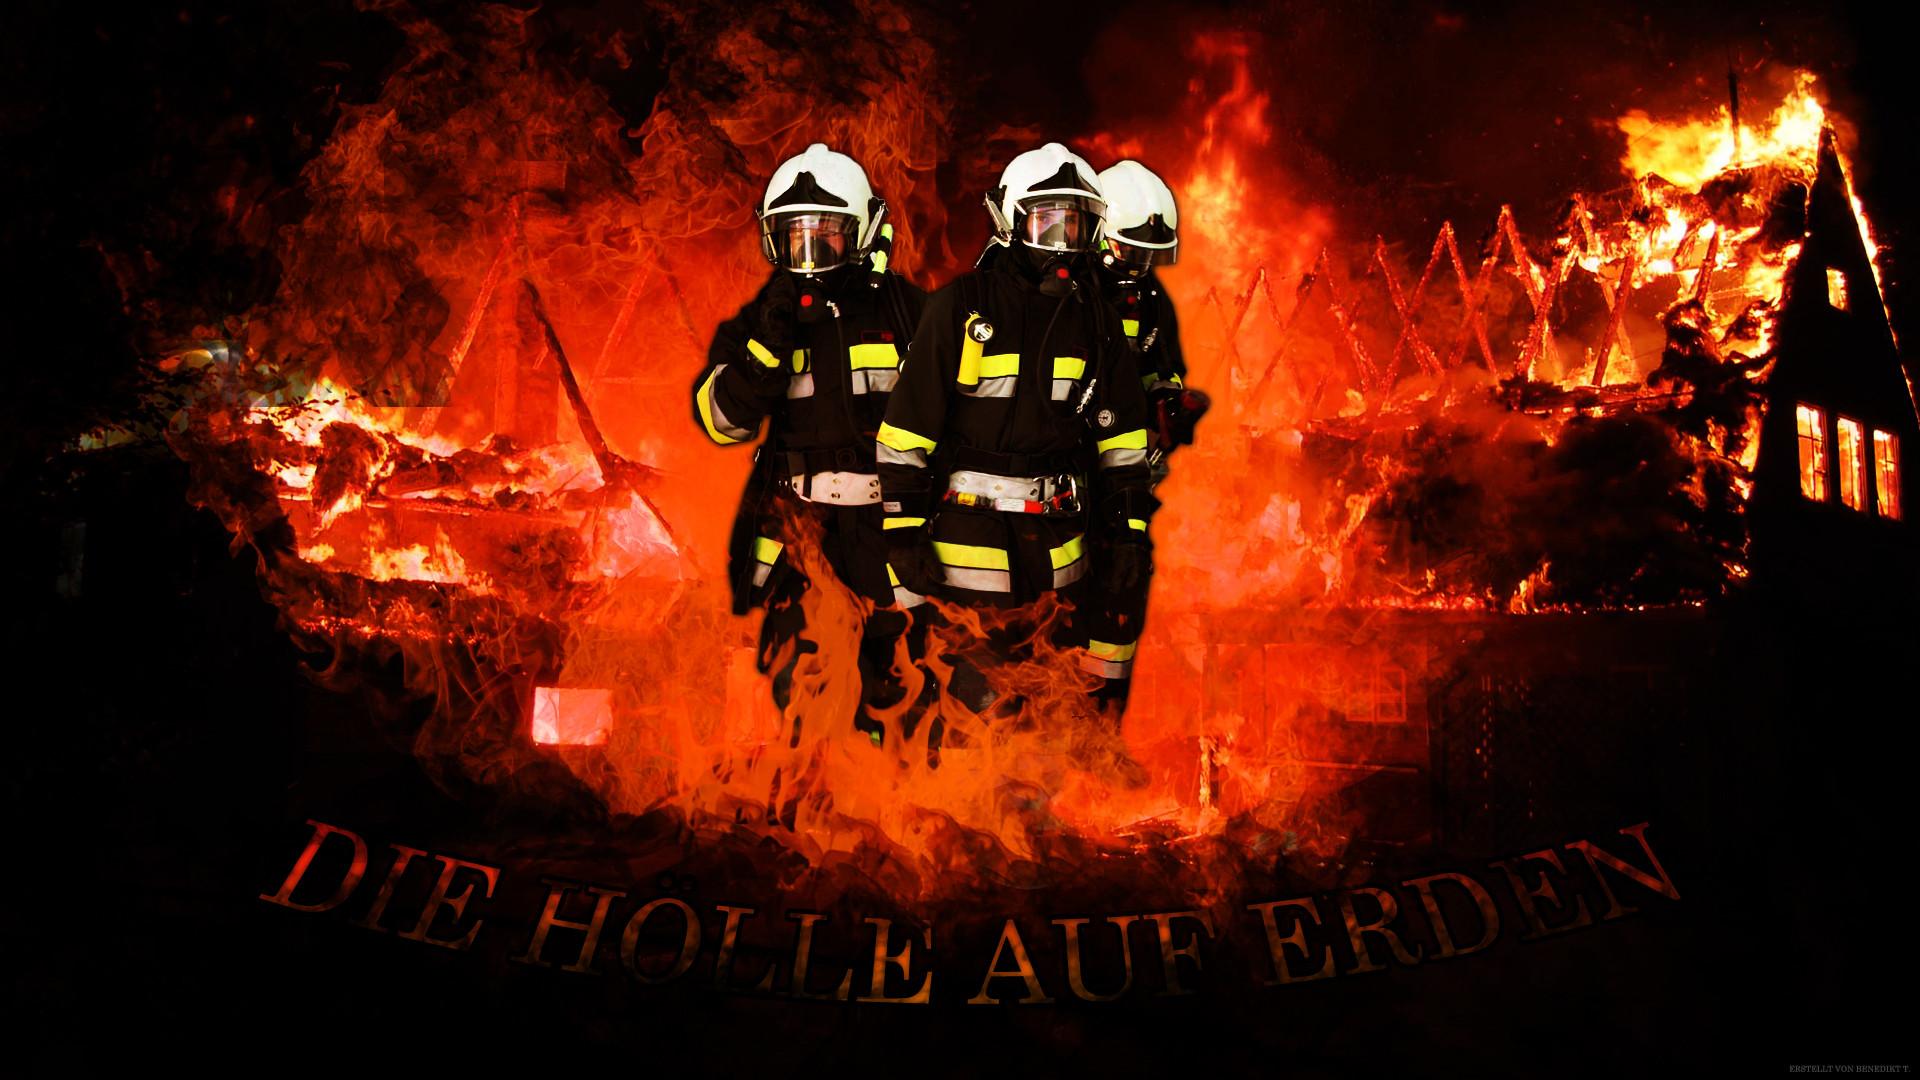 <b>firefighter</b> logo <b>wallpaper</b